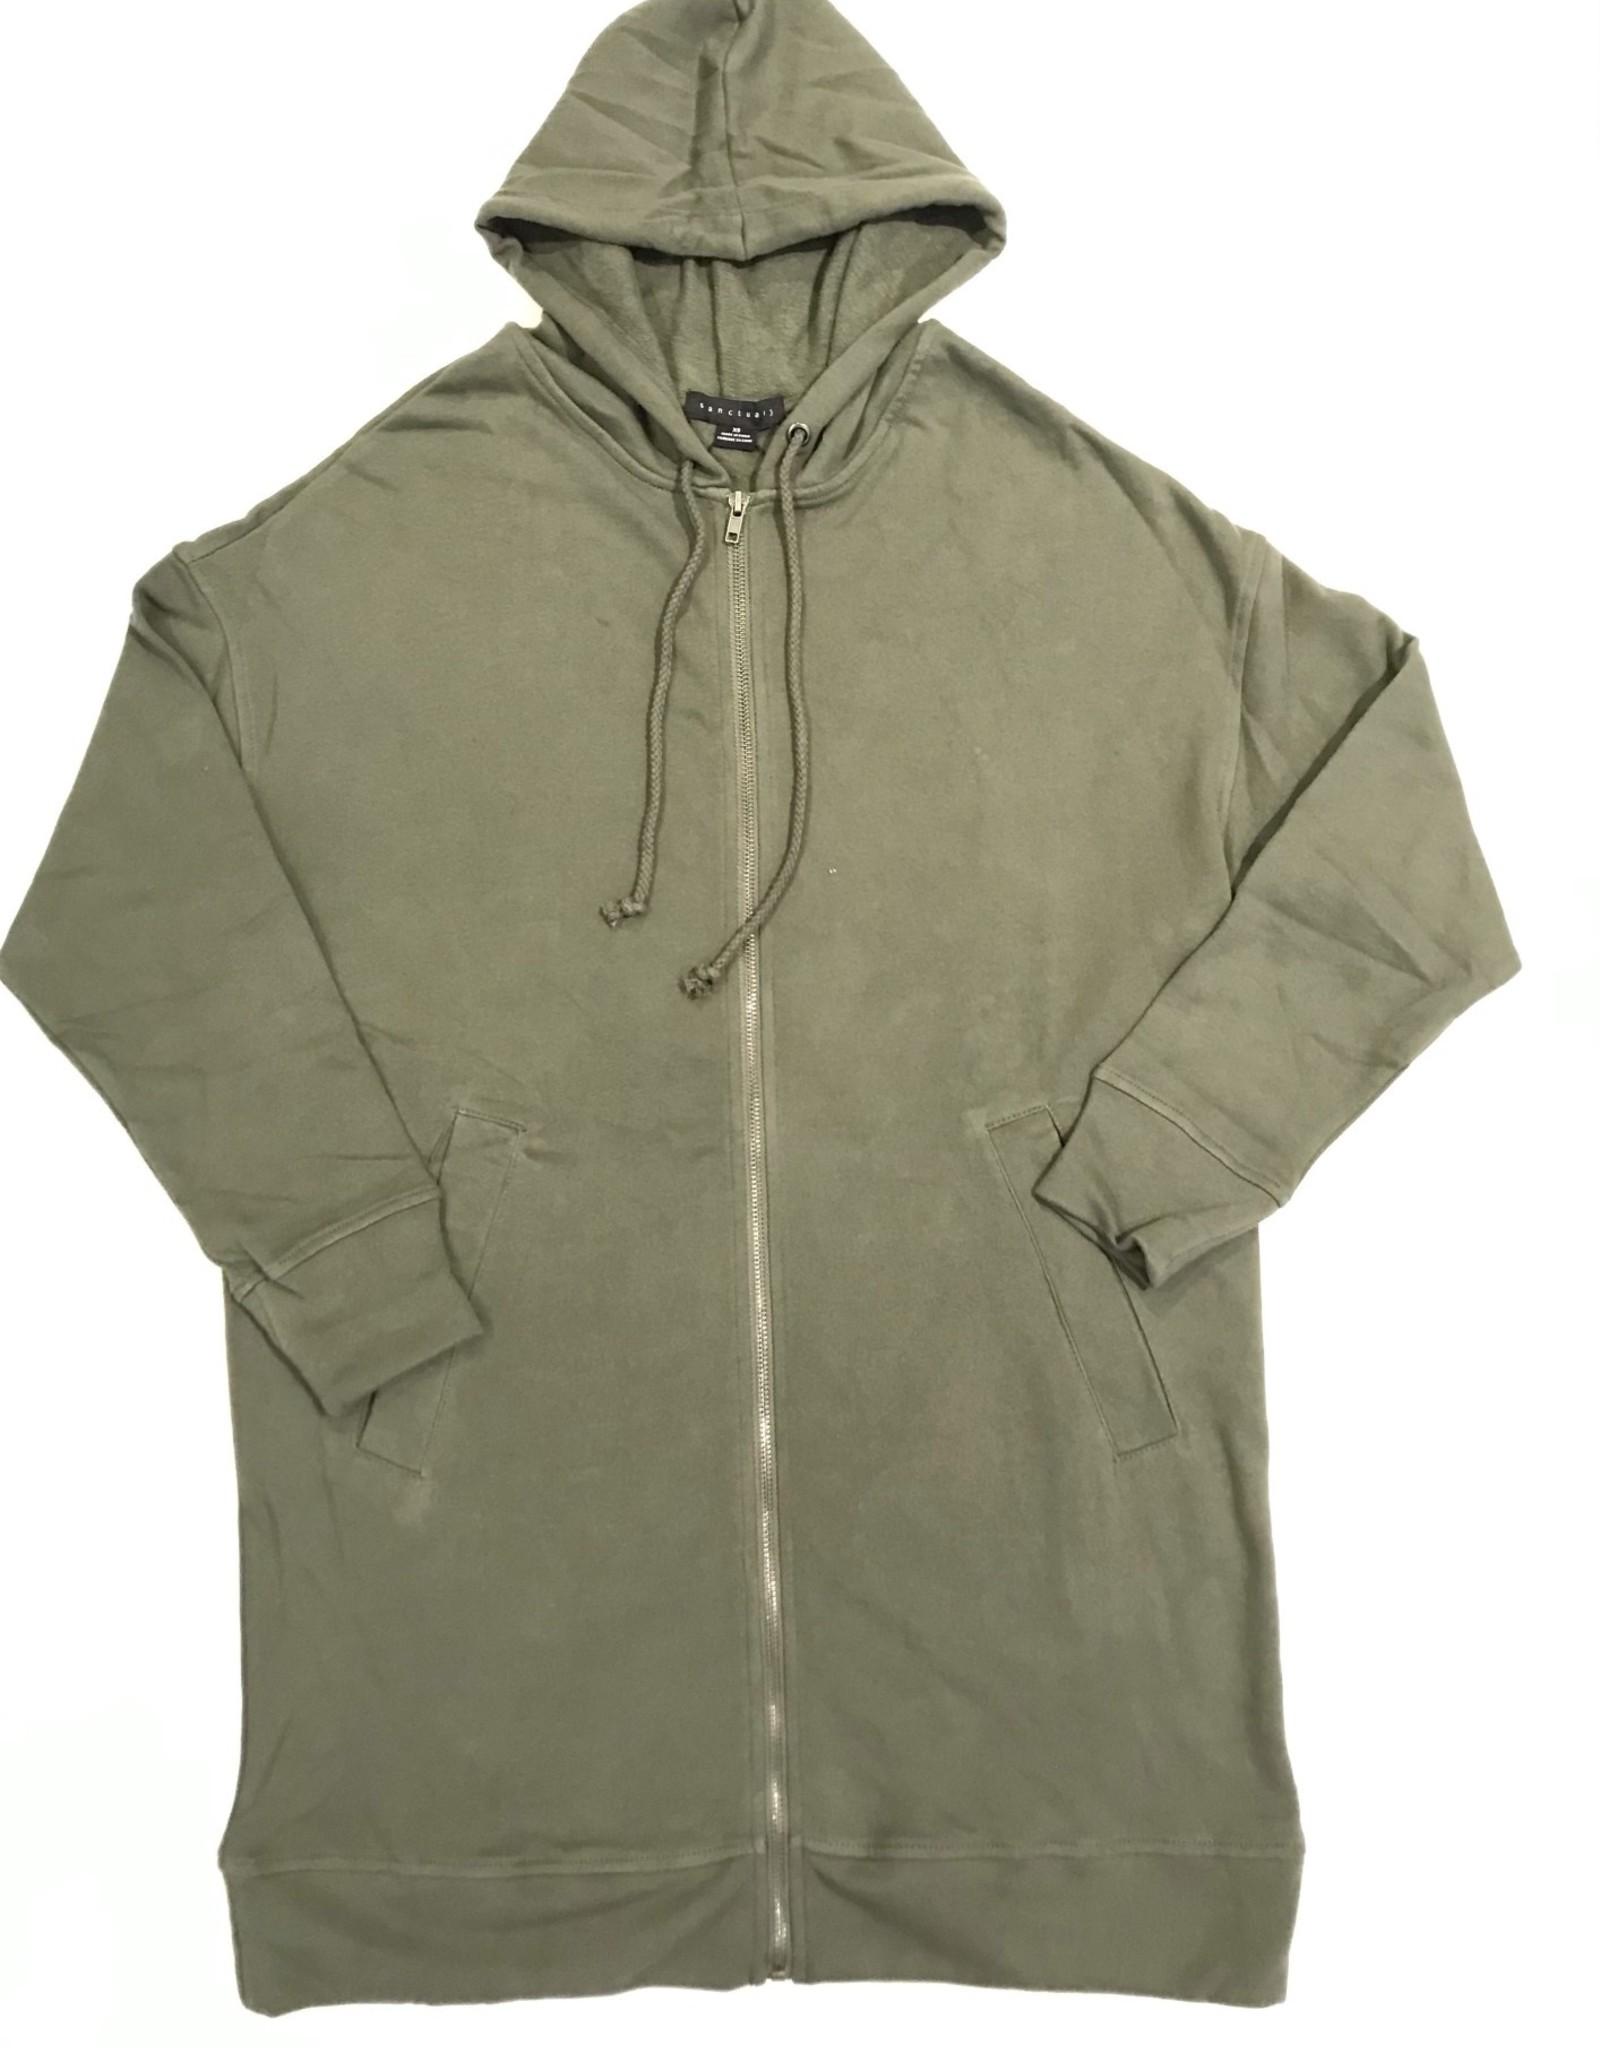 Sanc City Coat Hoodie CT3173CVF